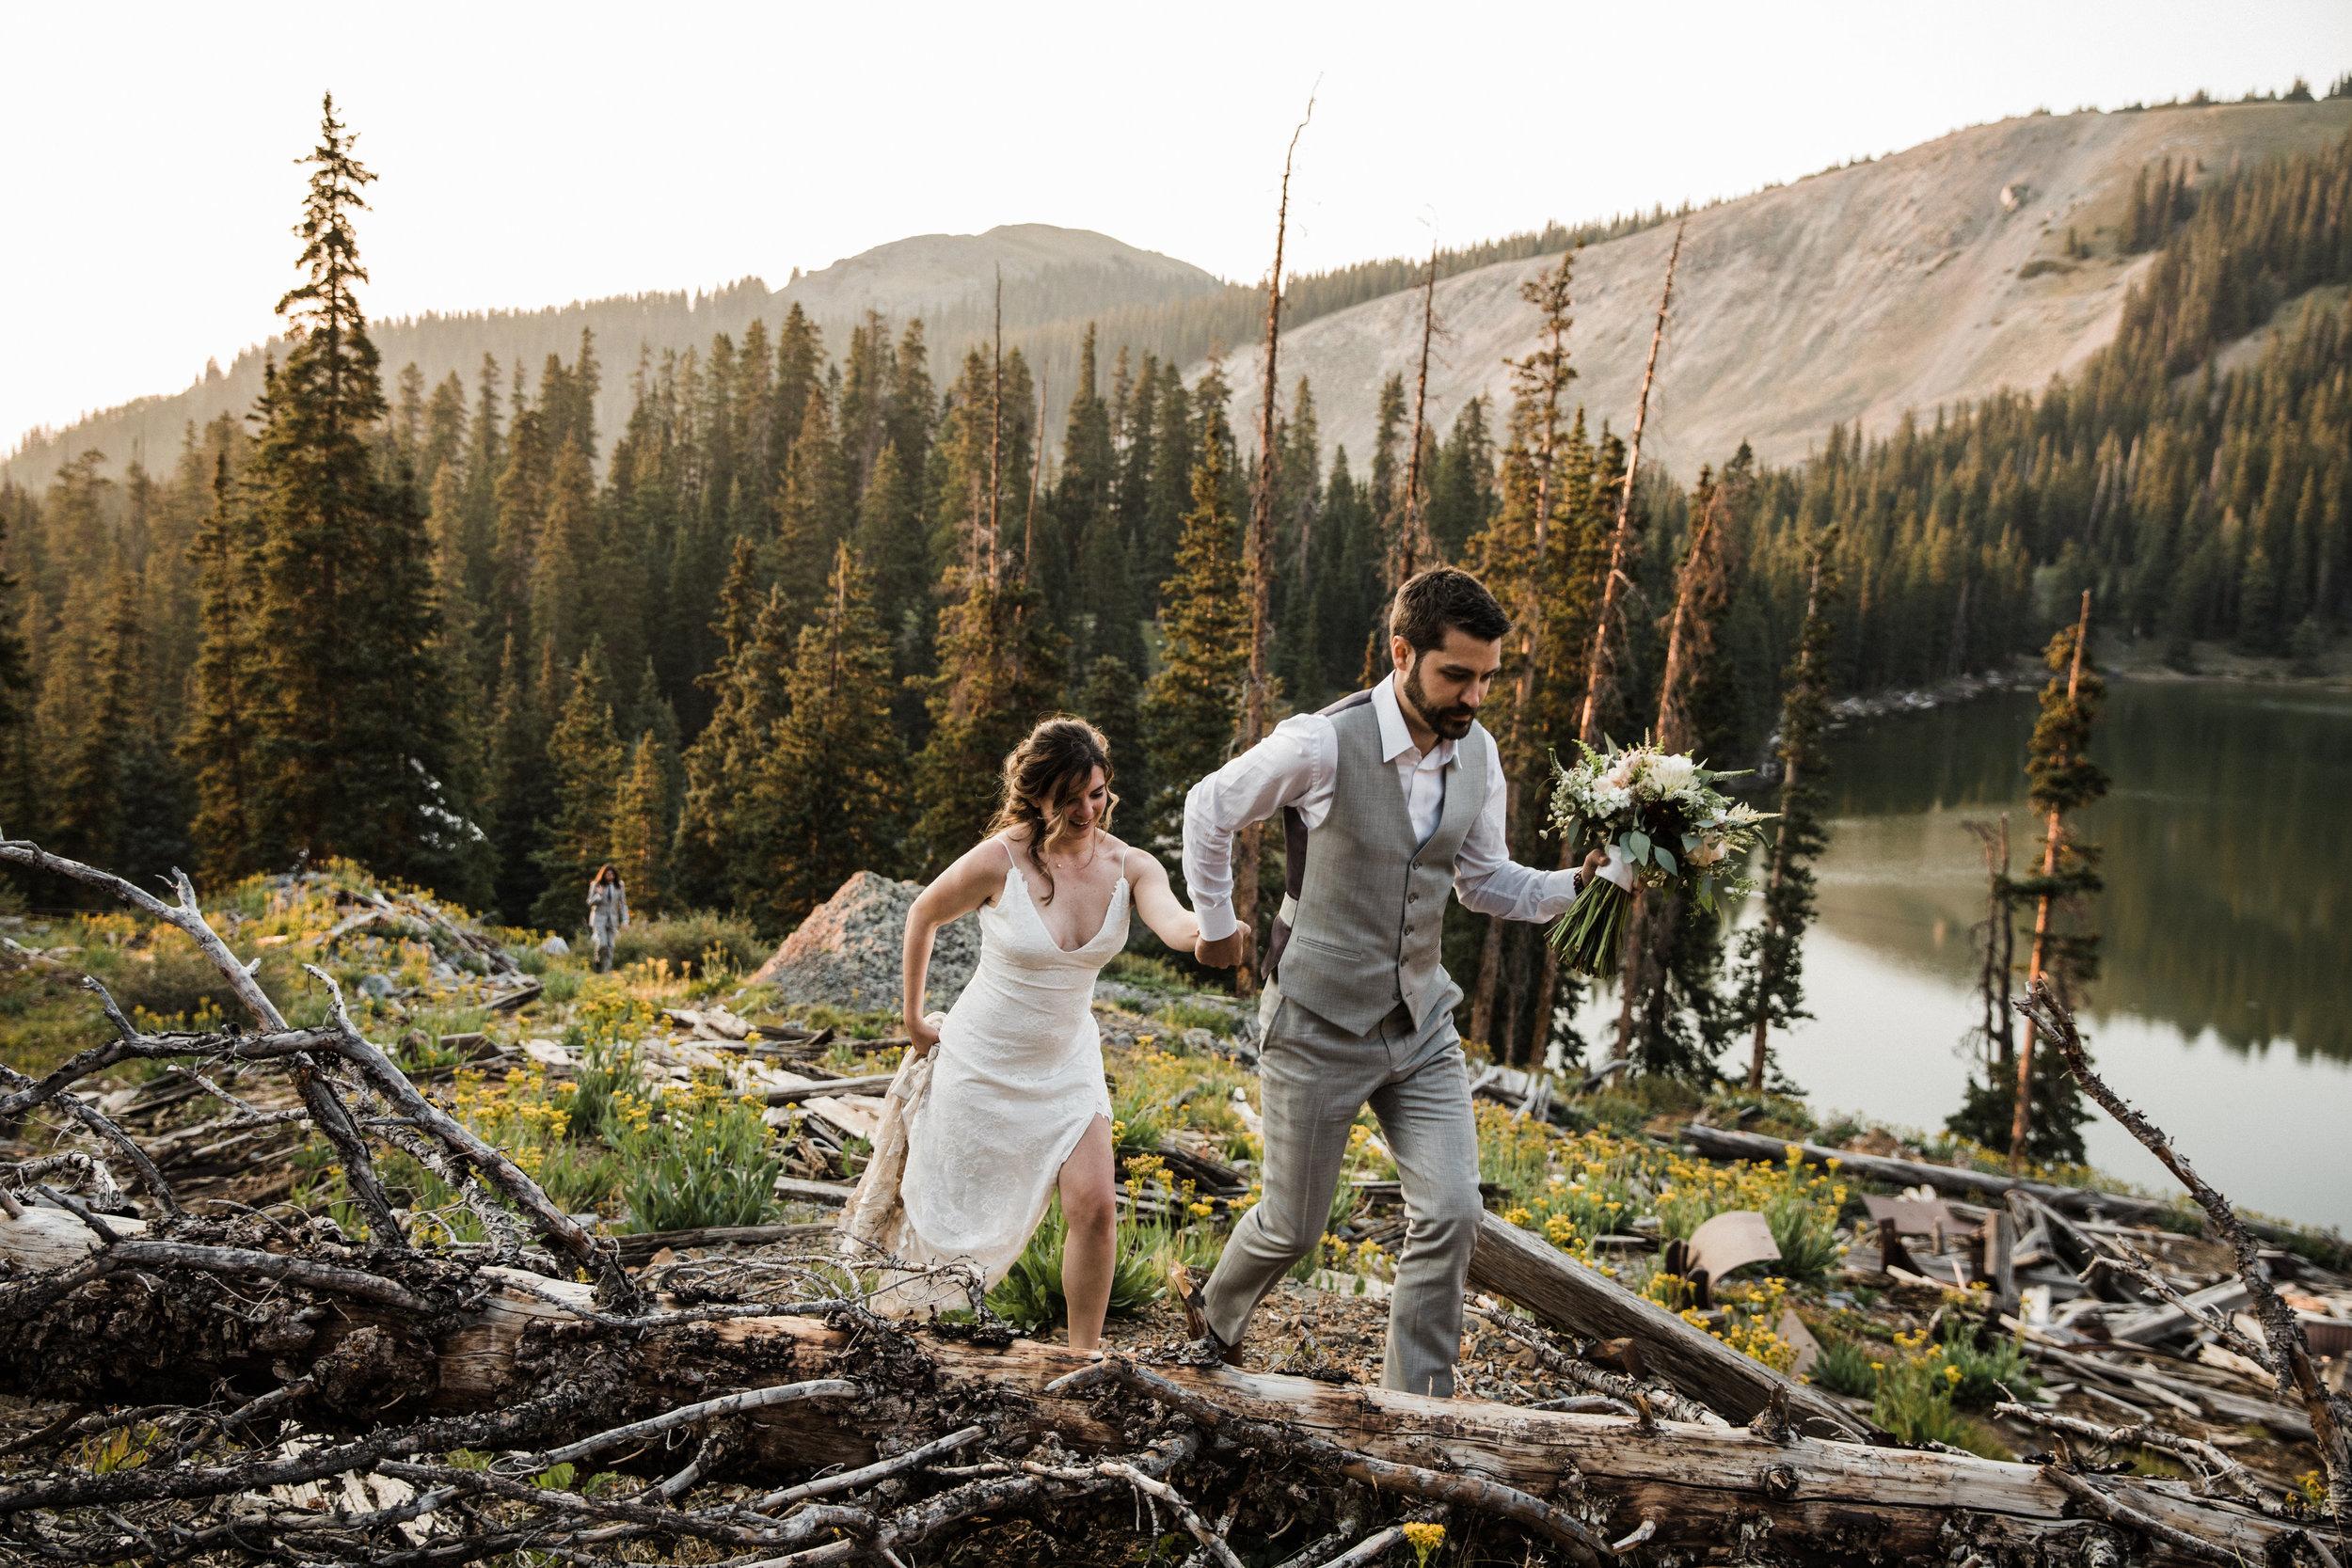 SB-leahandashton-telluride-wedding-photography-0041.jpg